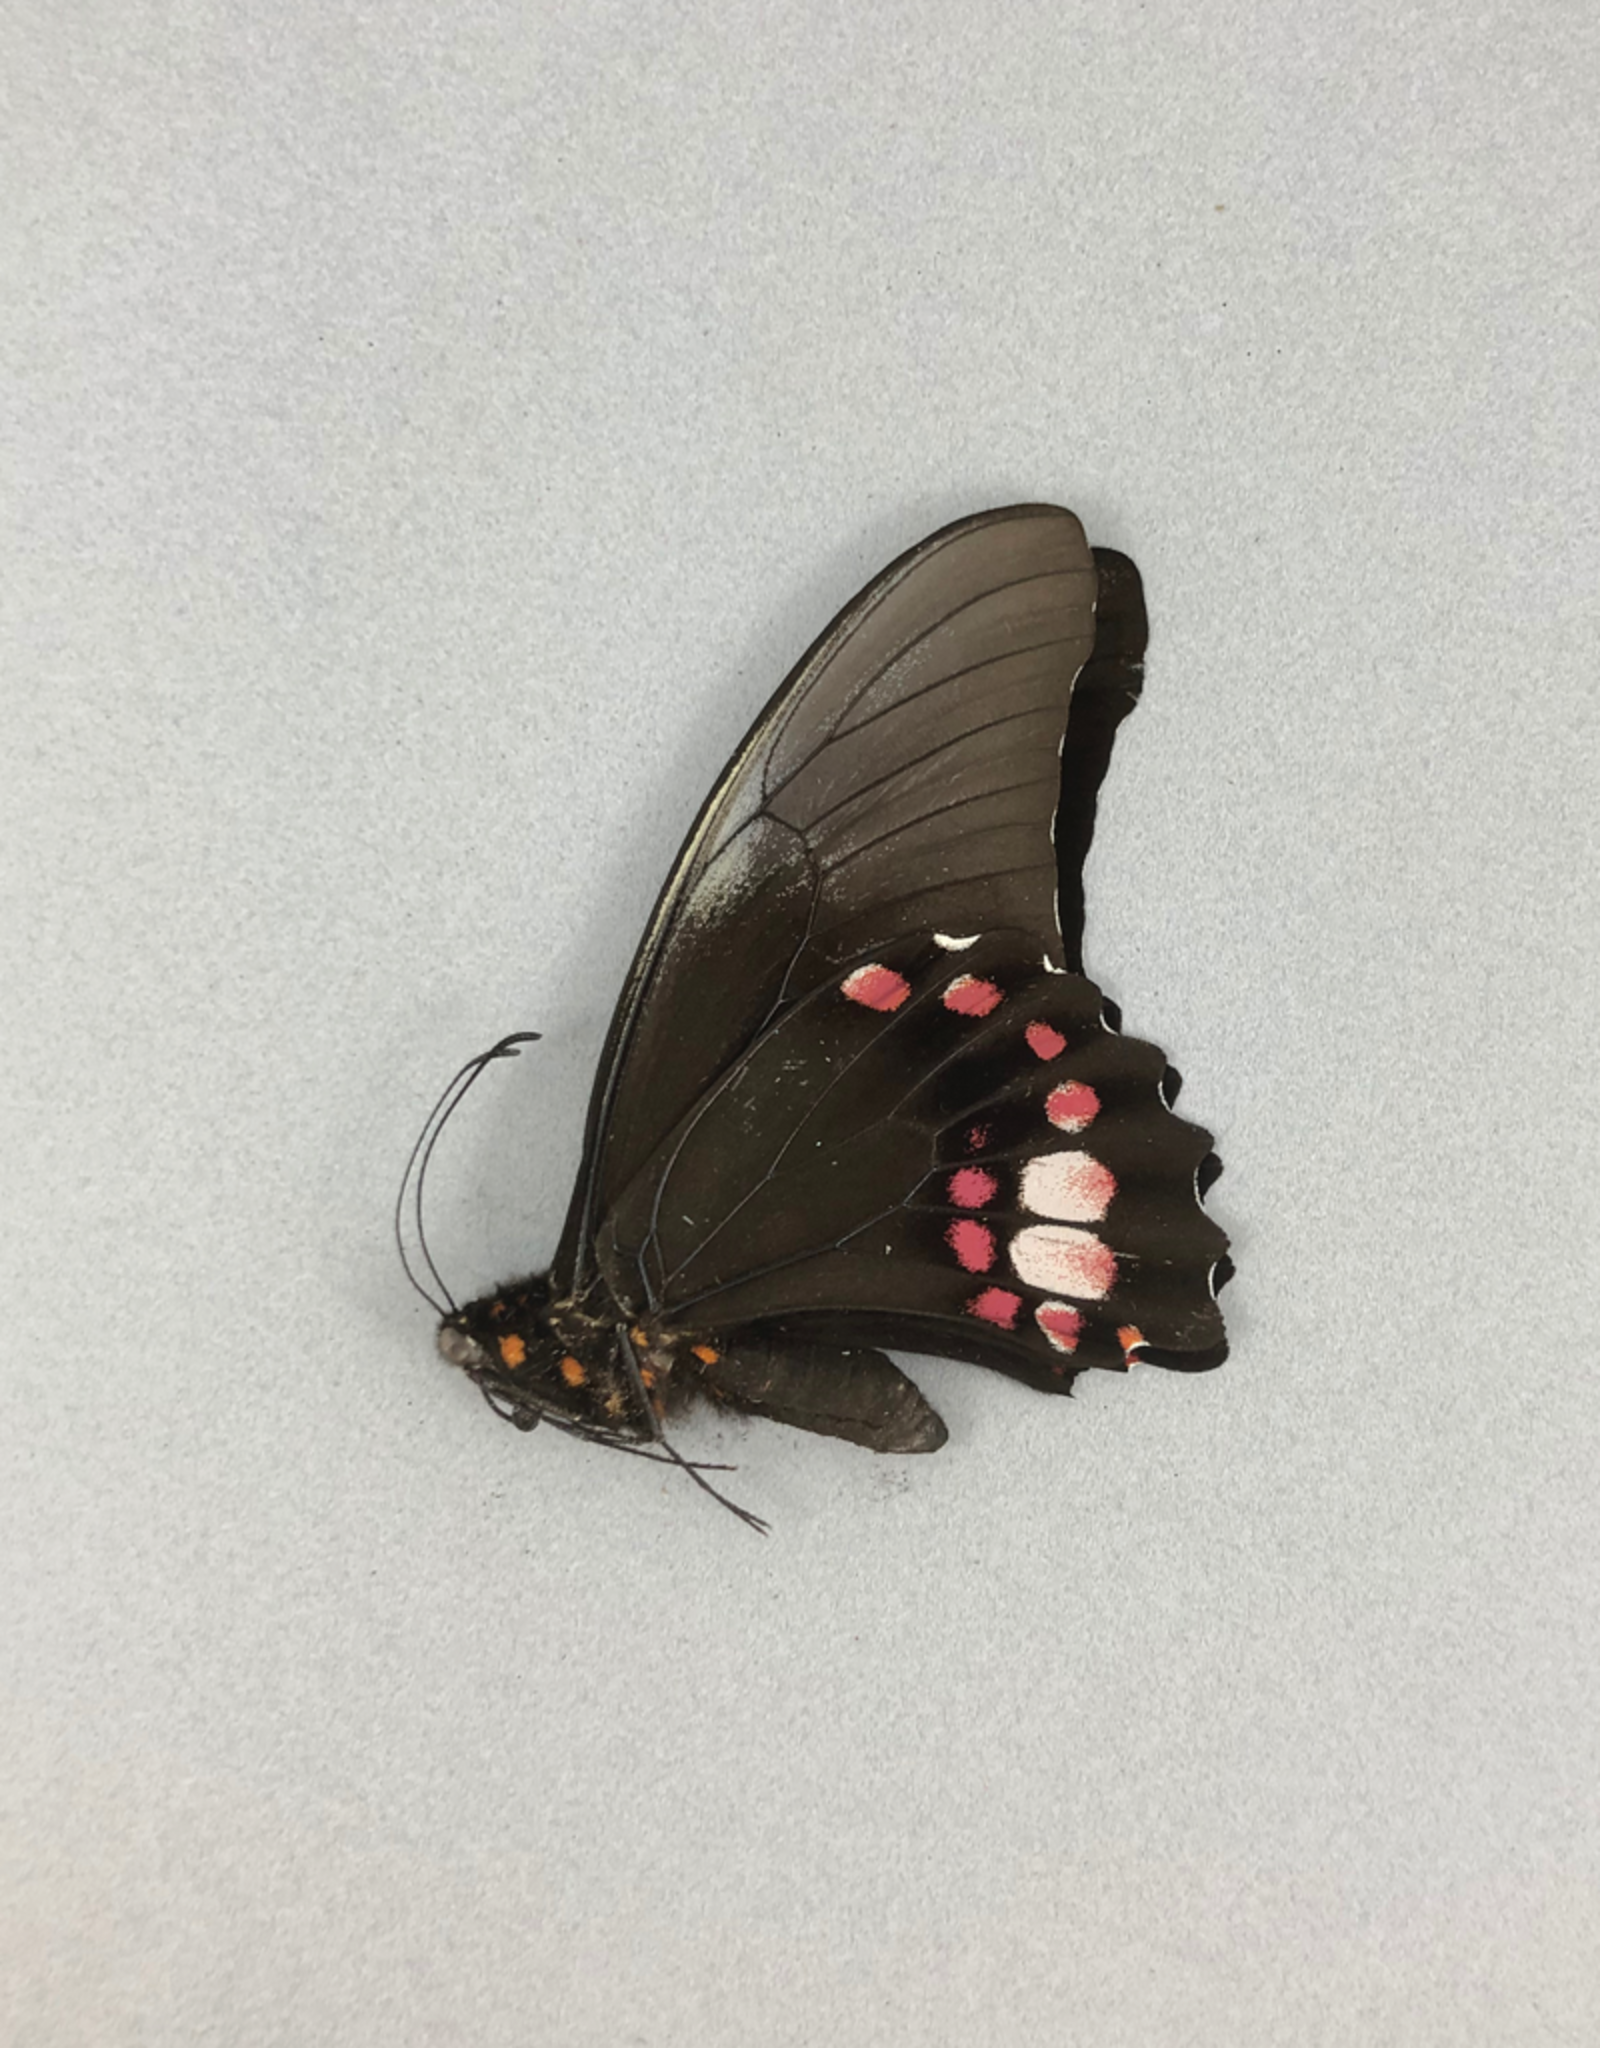 Papilio anchiasades idaeus M A1 Peru